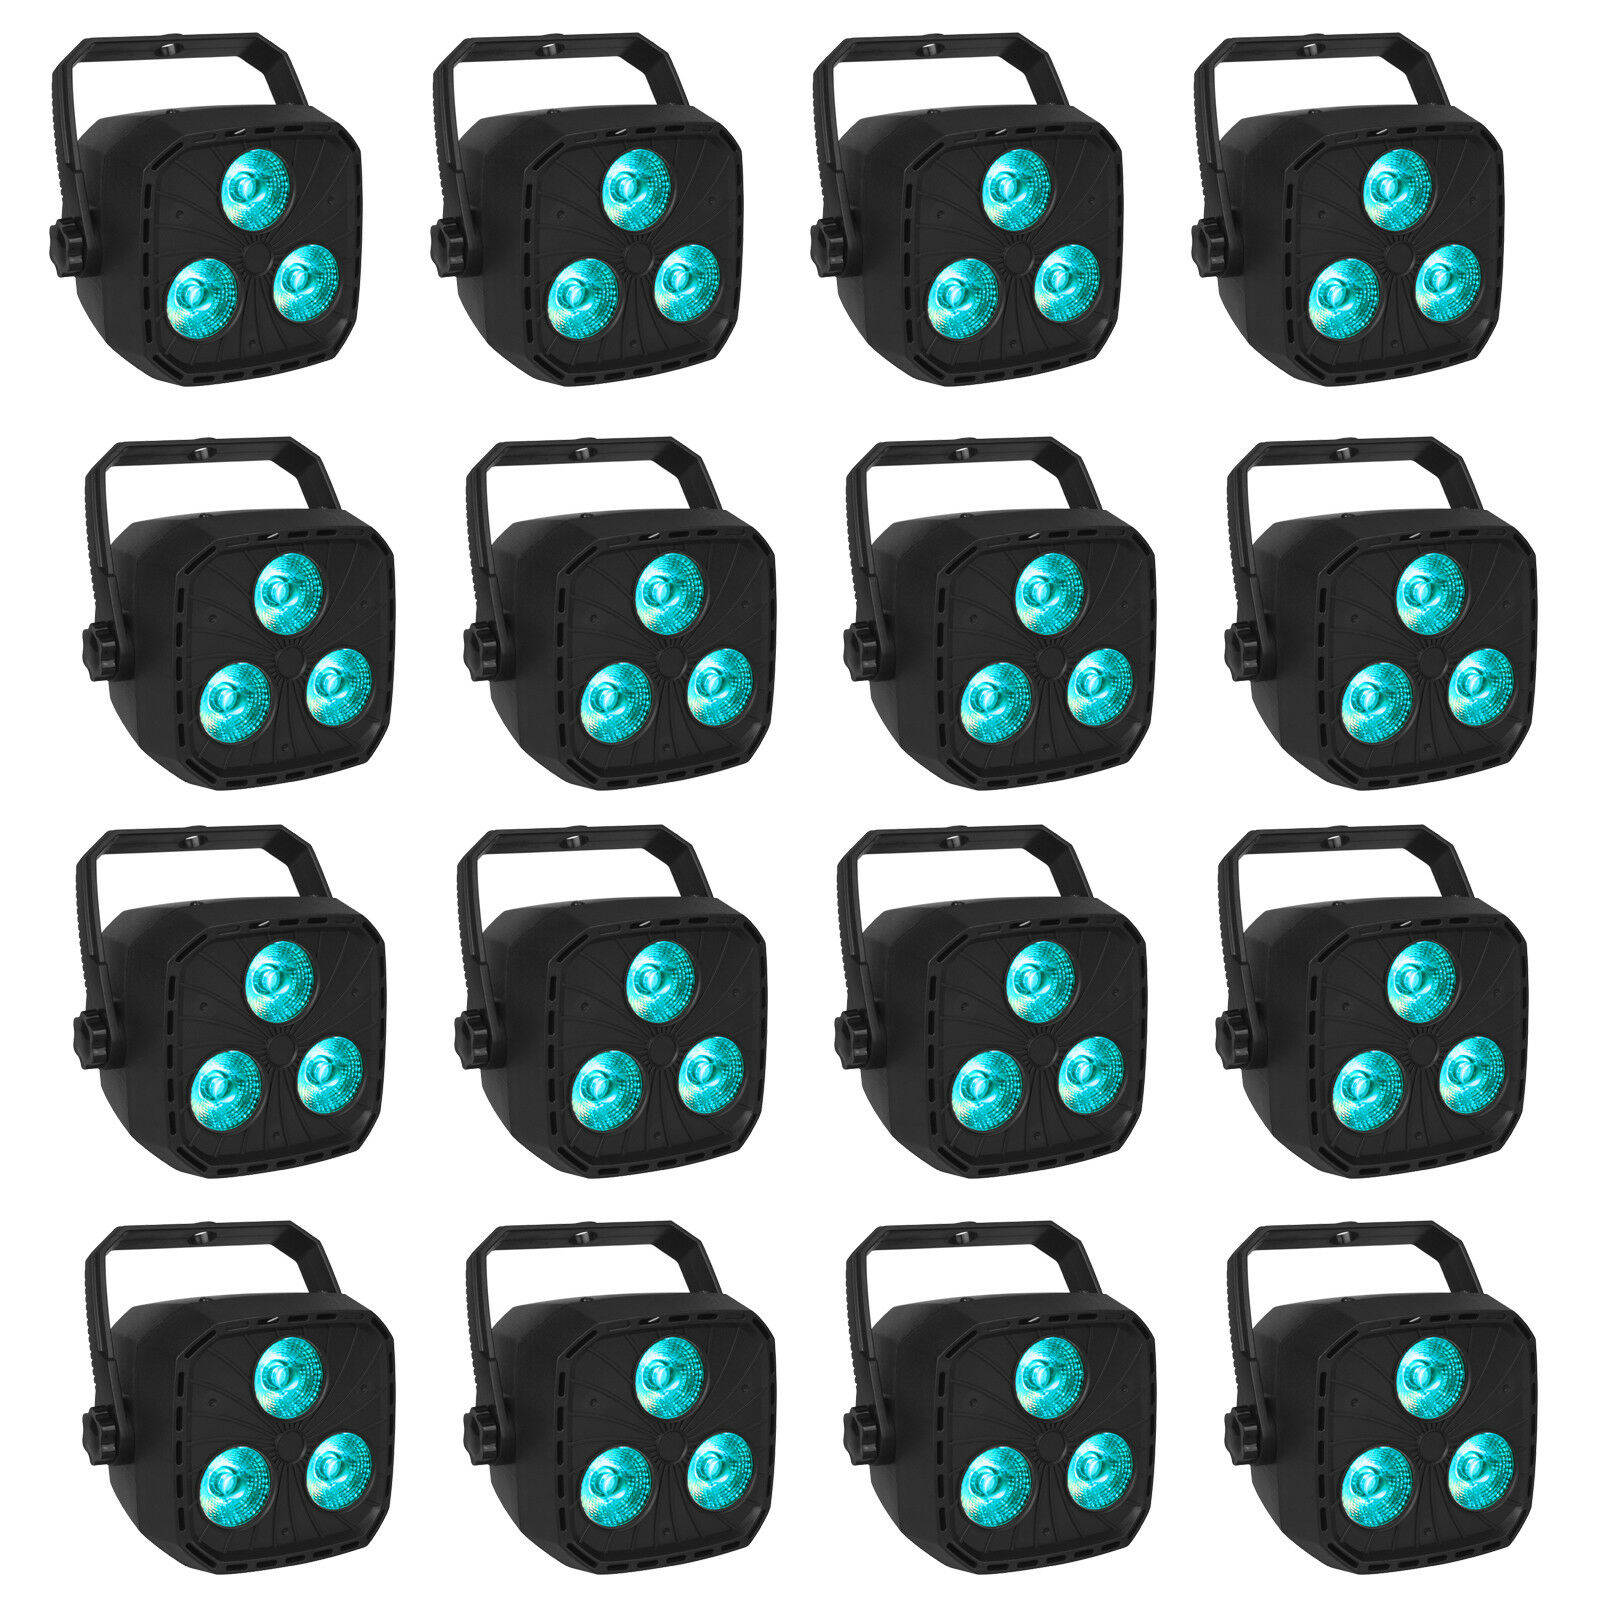 16 Pack Par Kann RGBW Led DMX512 Sound Activated Wedding Wall Washing